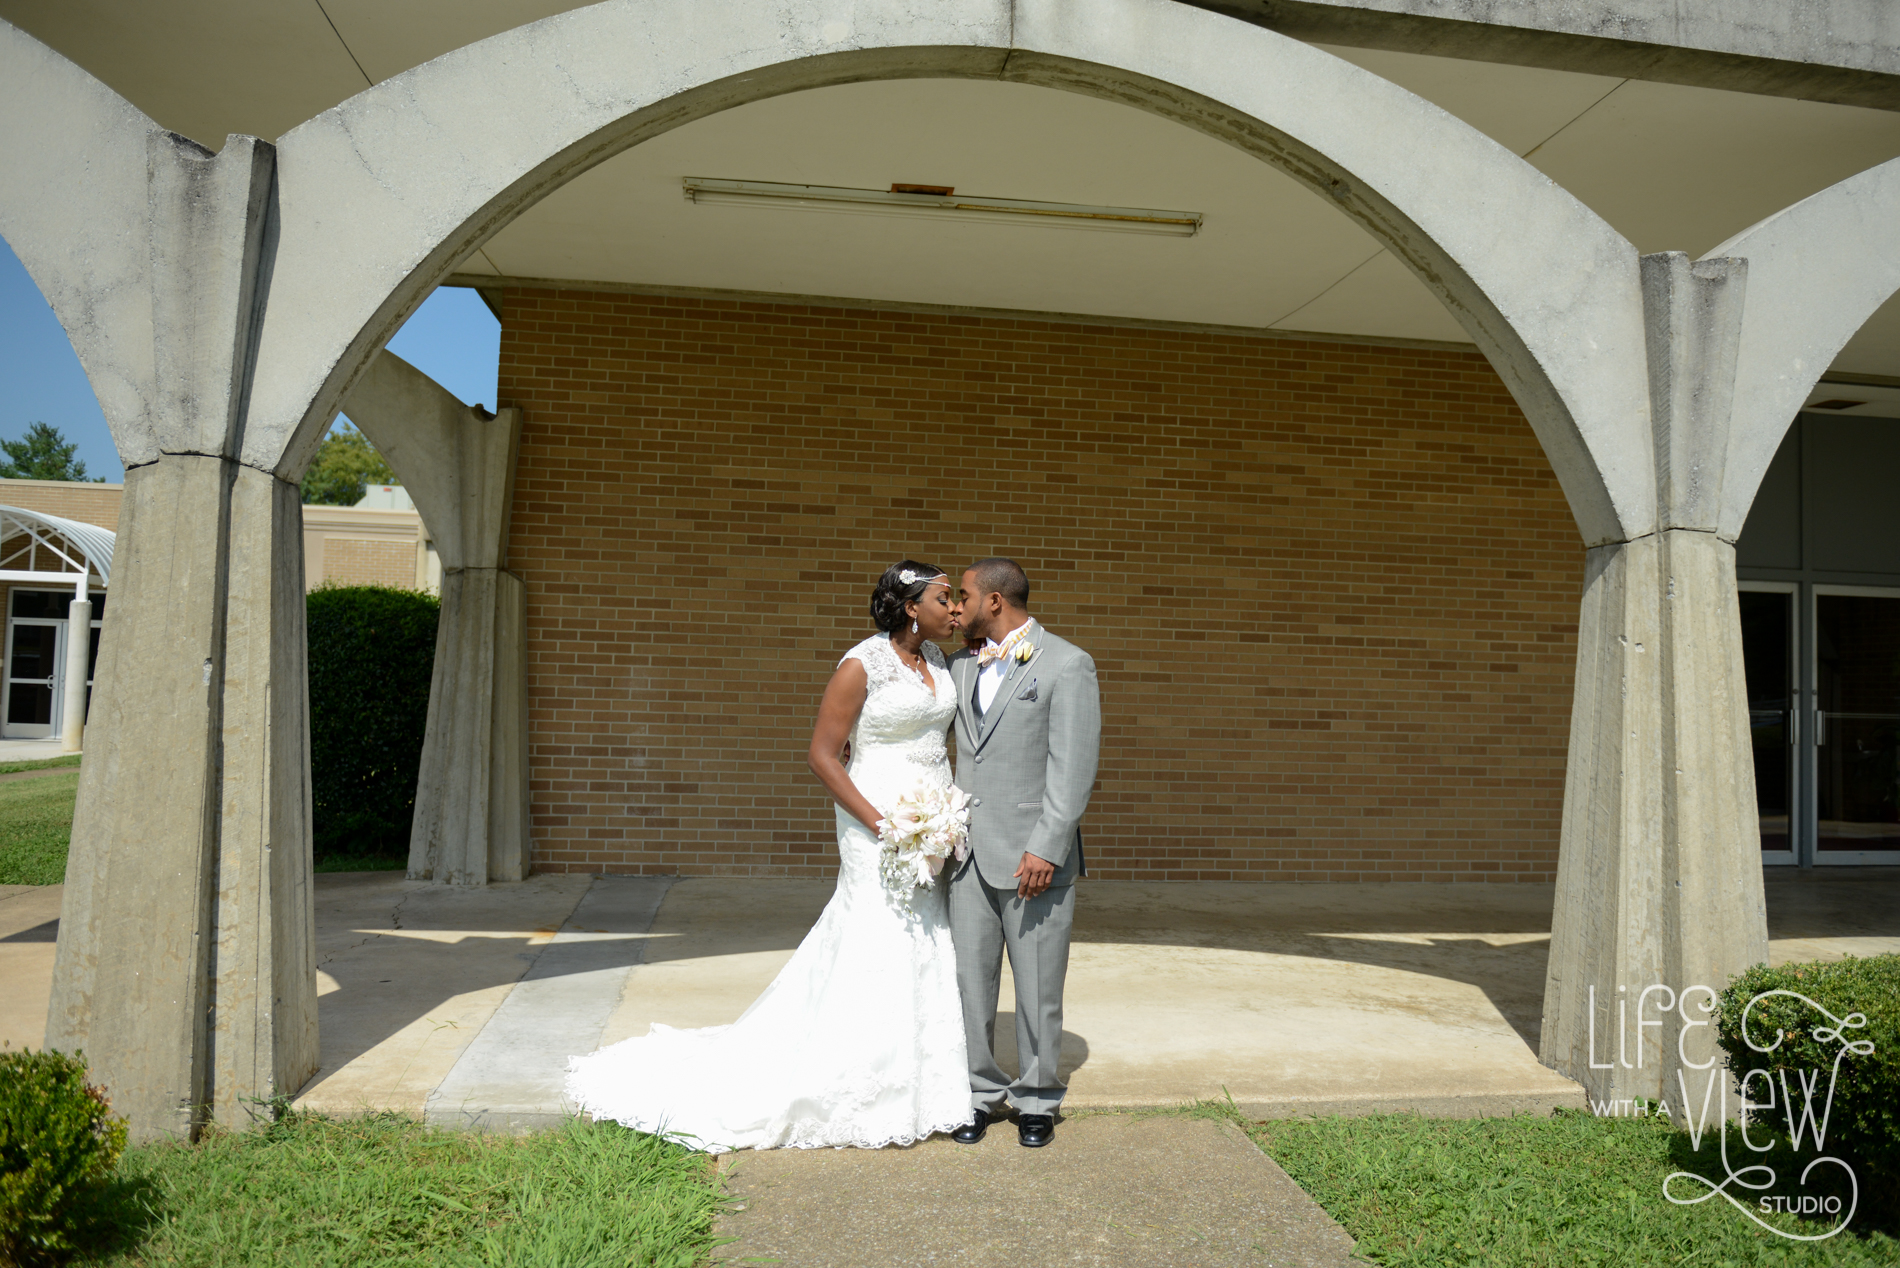 Stratton-Hall-Wedding-12.jpg